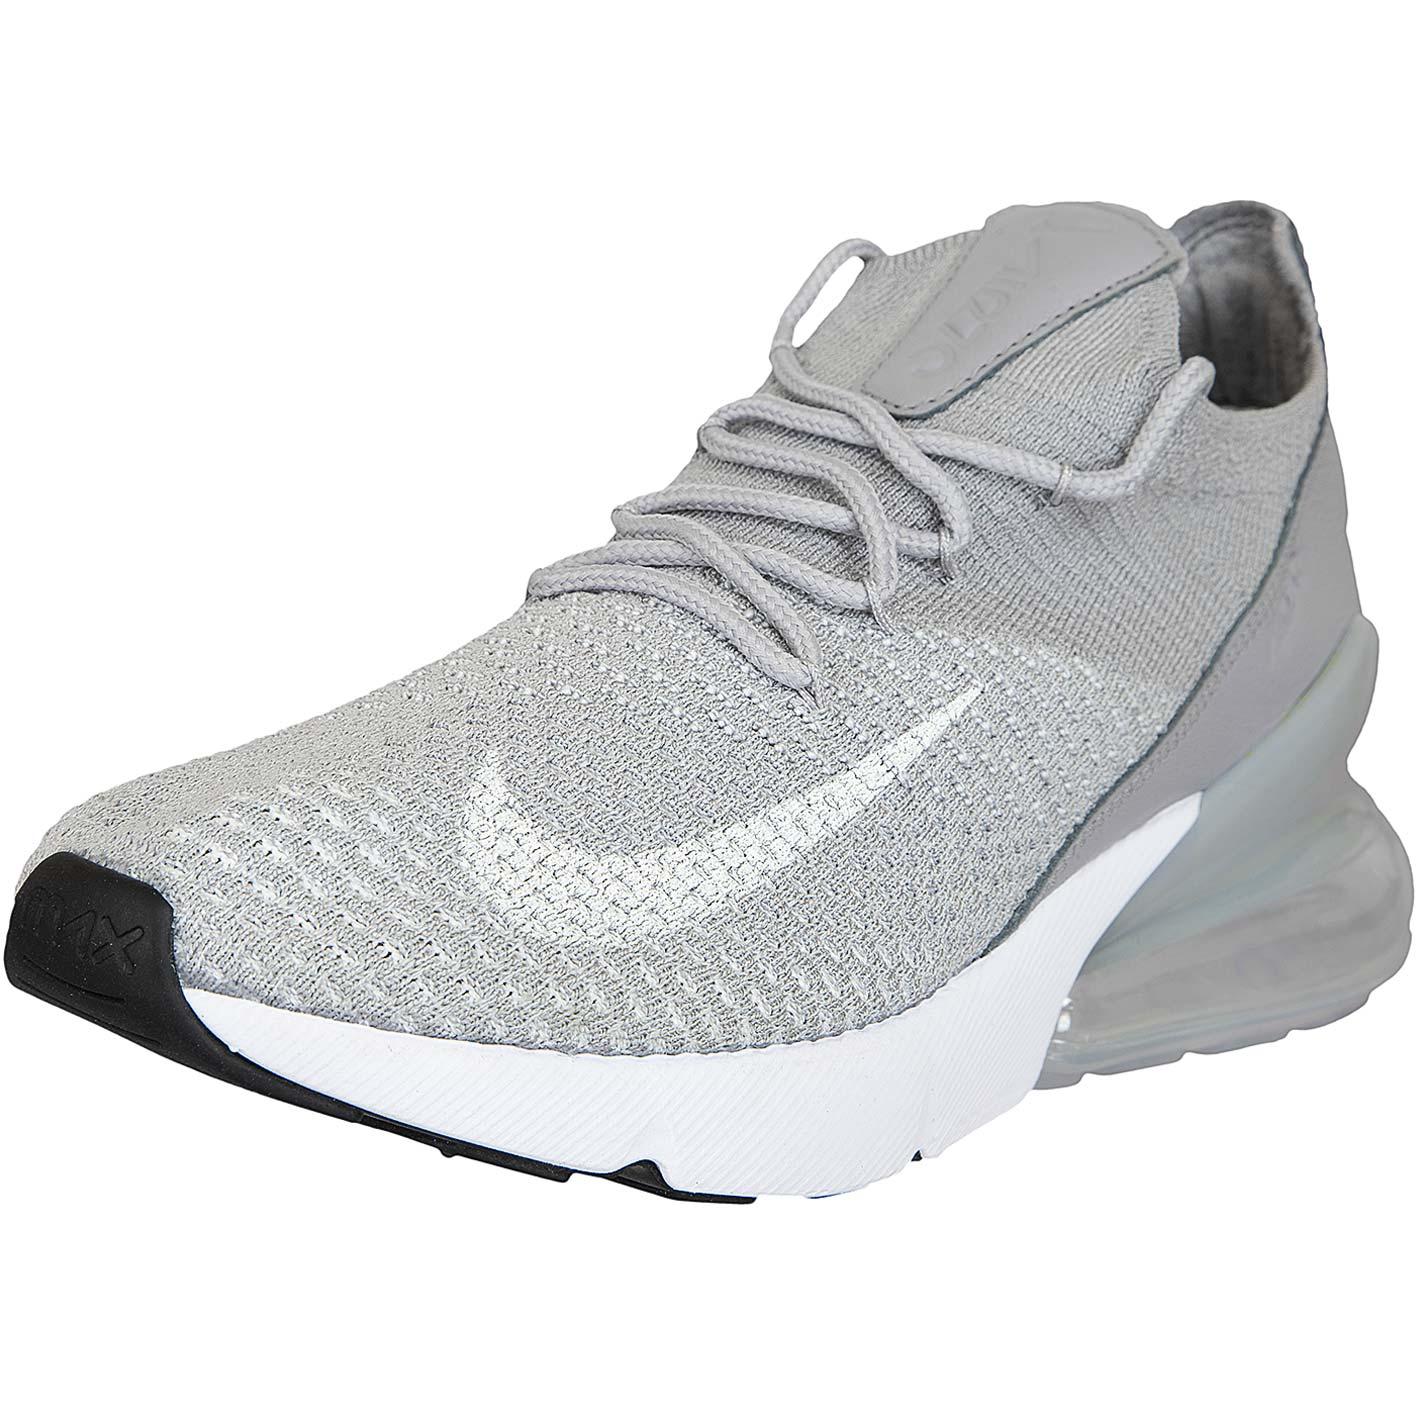 finest selection 692fb d4361 Nike Damen Sneaker Air Max 270 Flyknit grau weiß